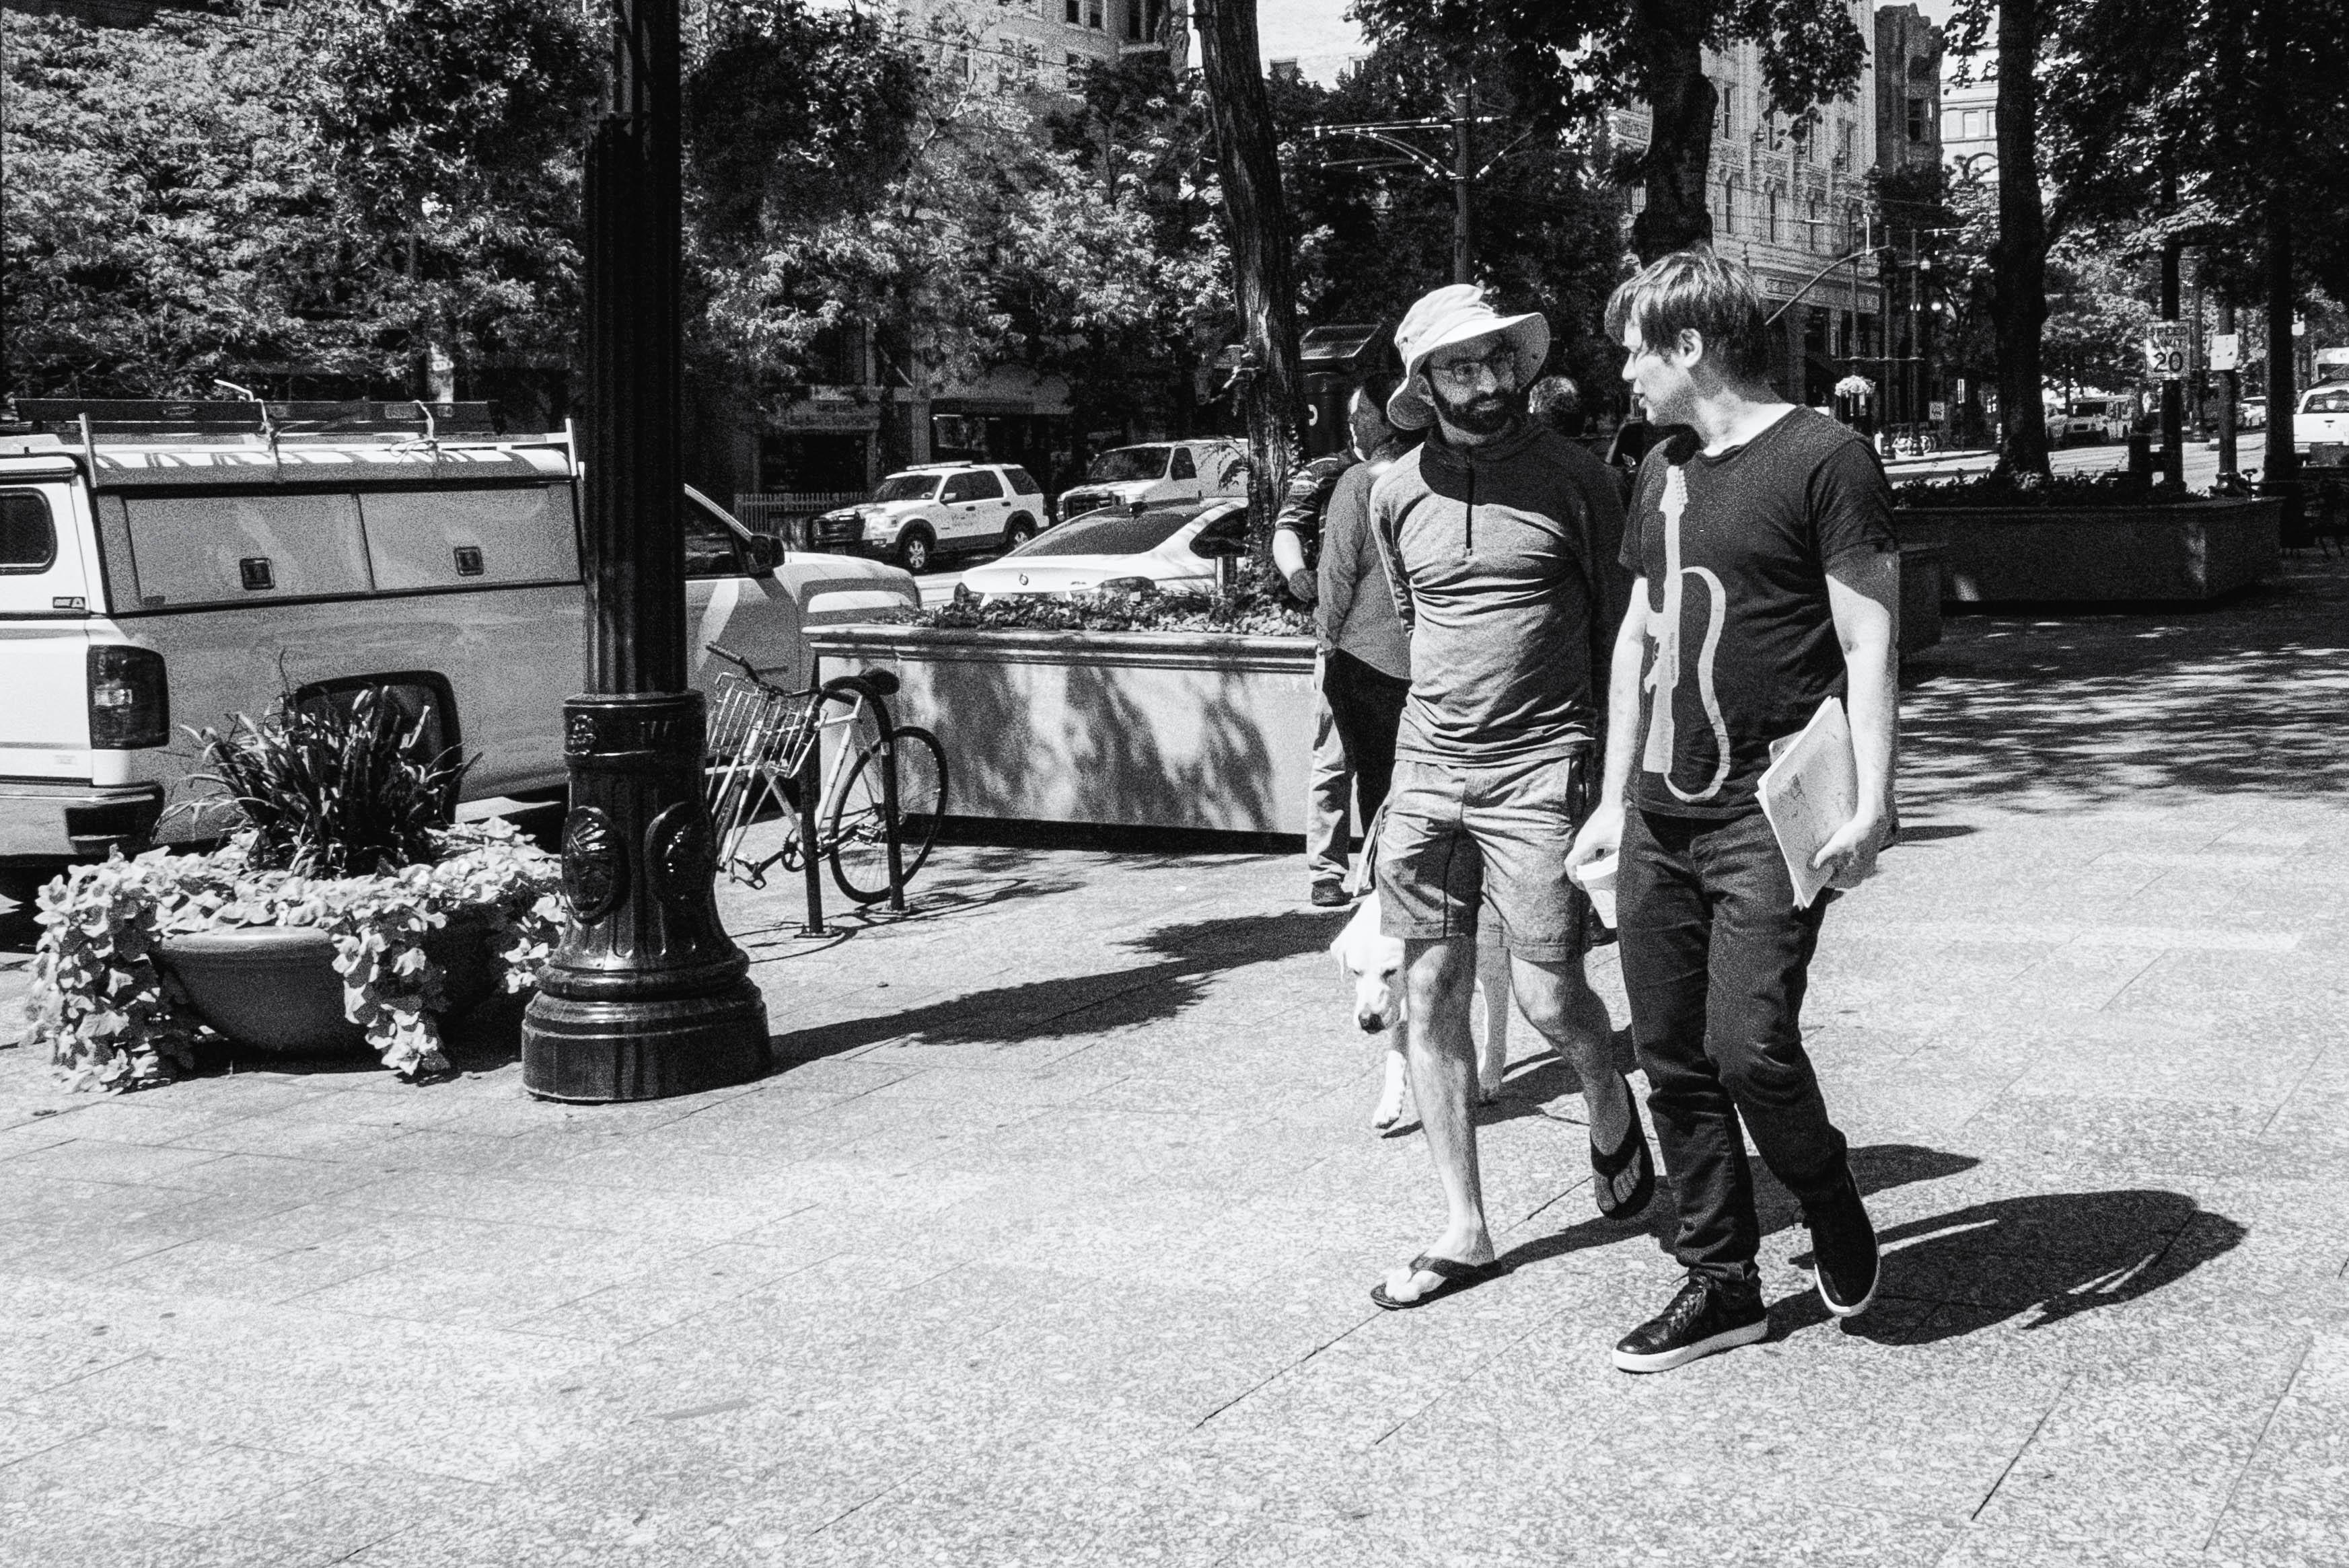 Street Talking Photography By CyberShutterbug